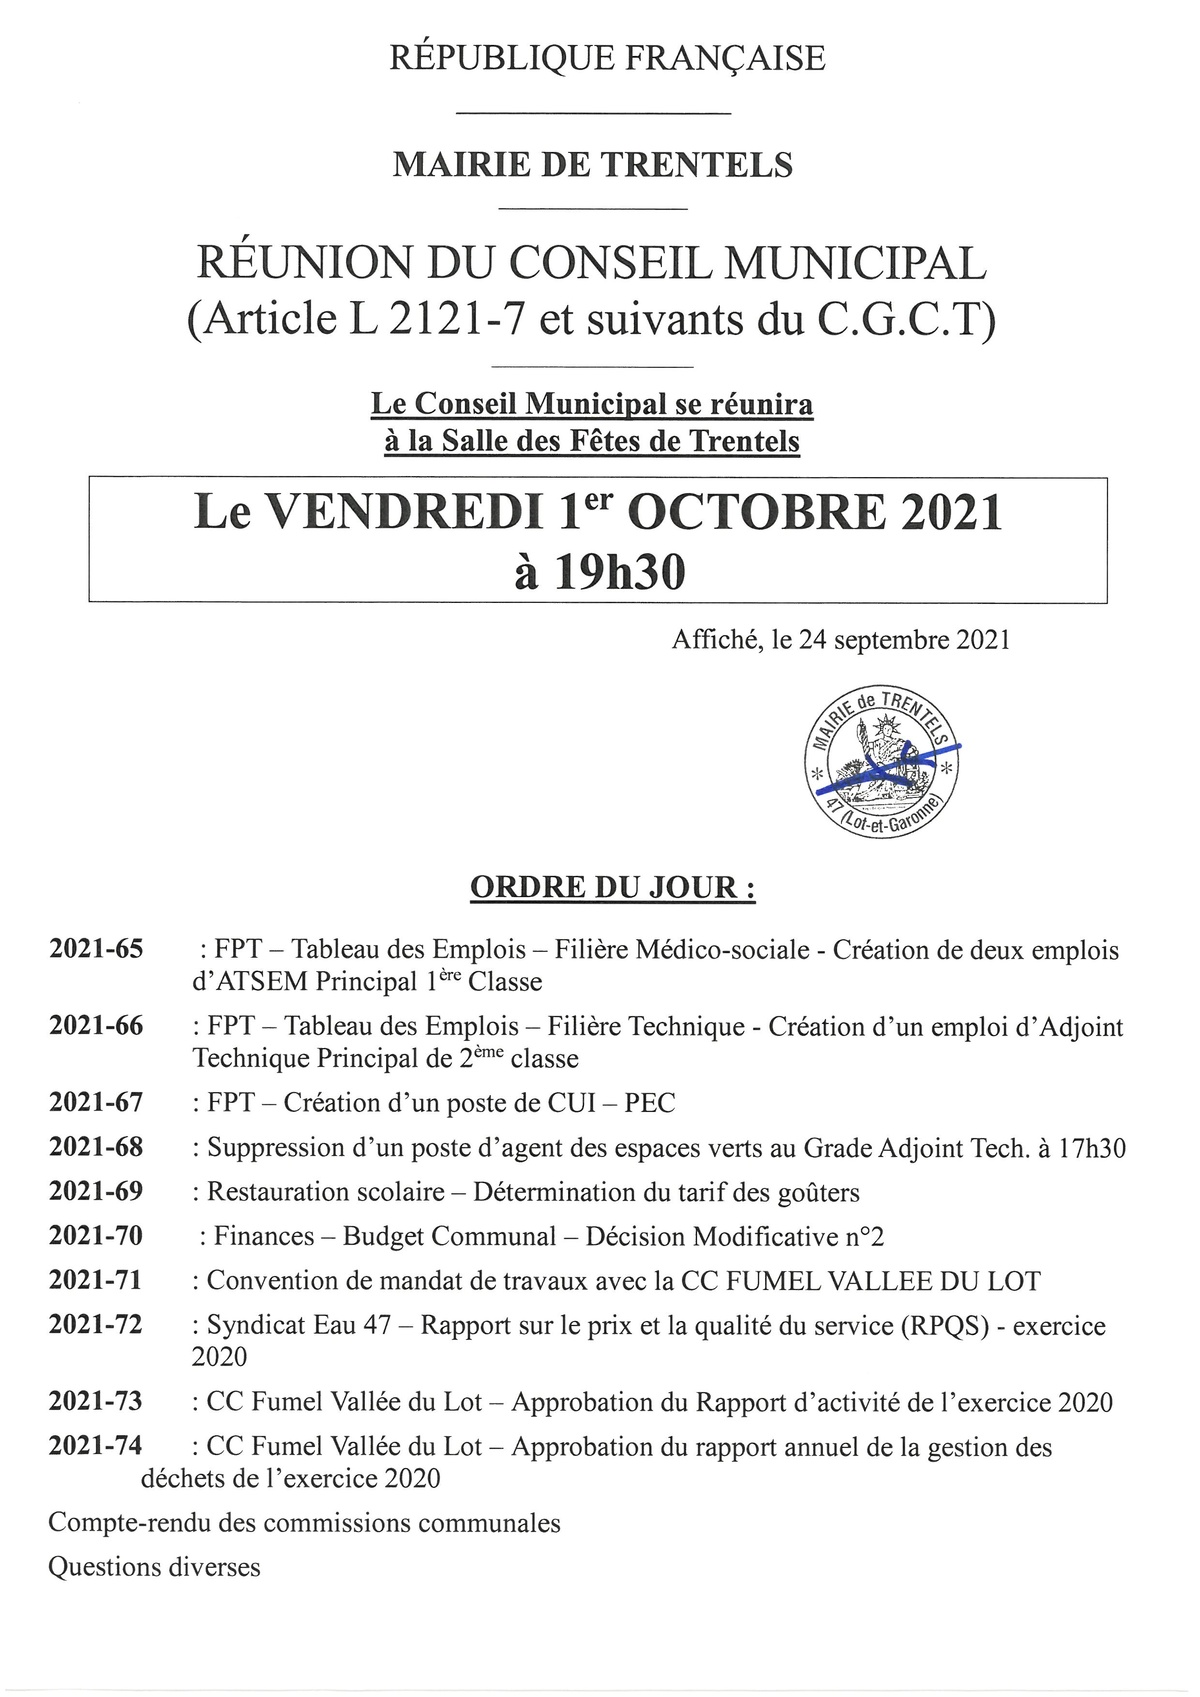 Conseil municipal du 01 10 2021